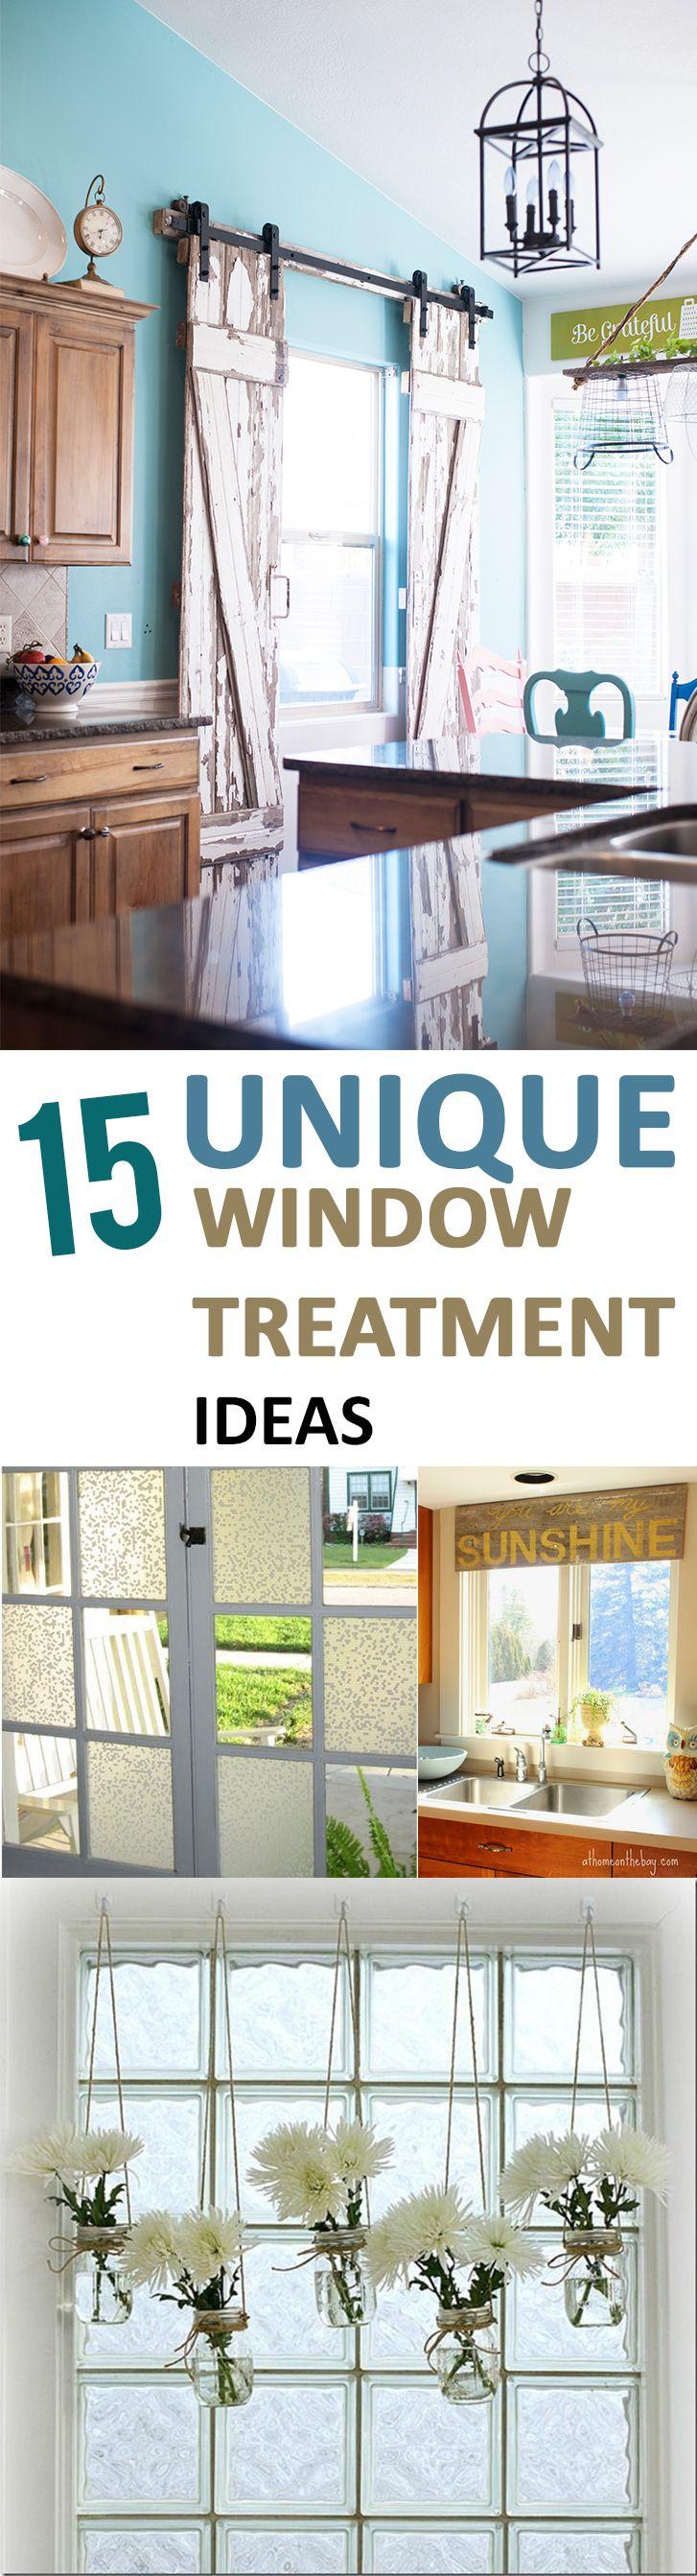 Window Treatment Ideas For Bathroom